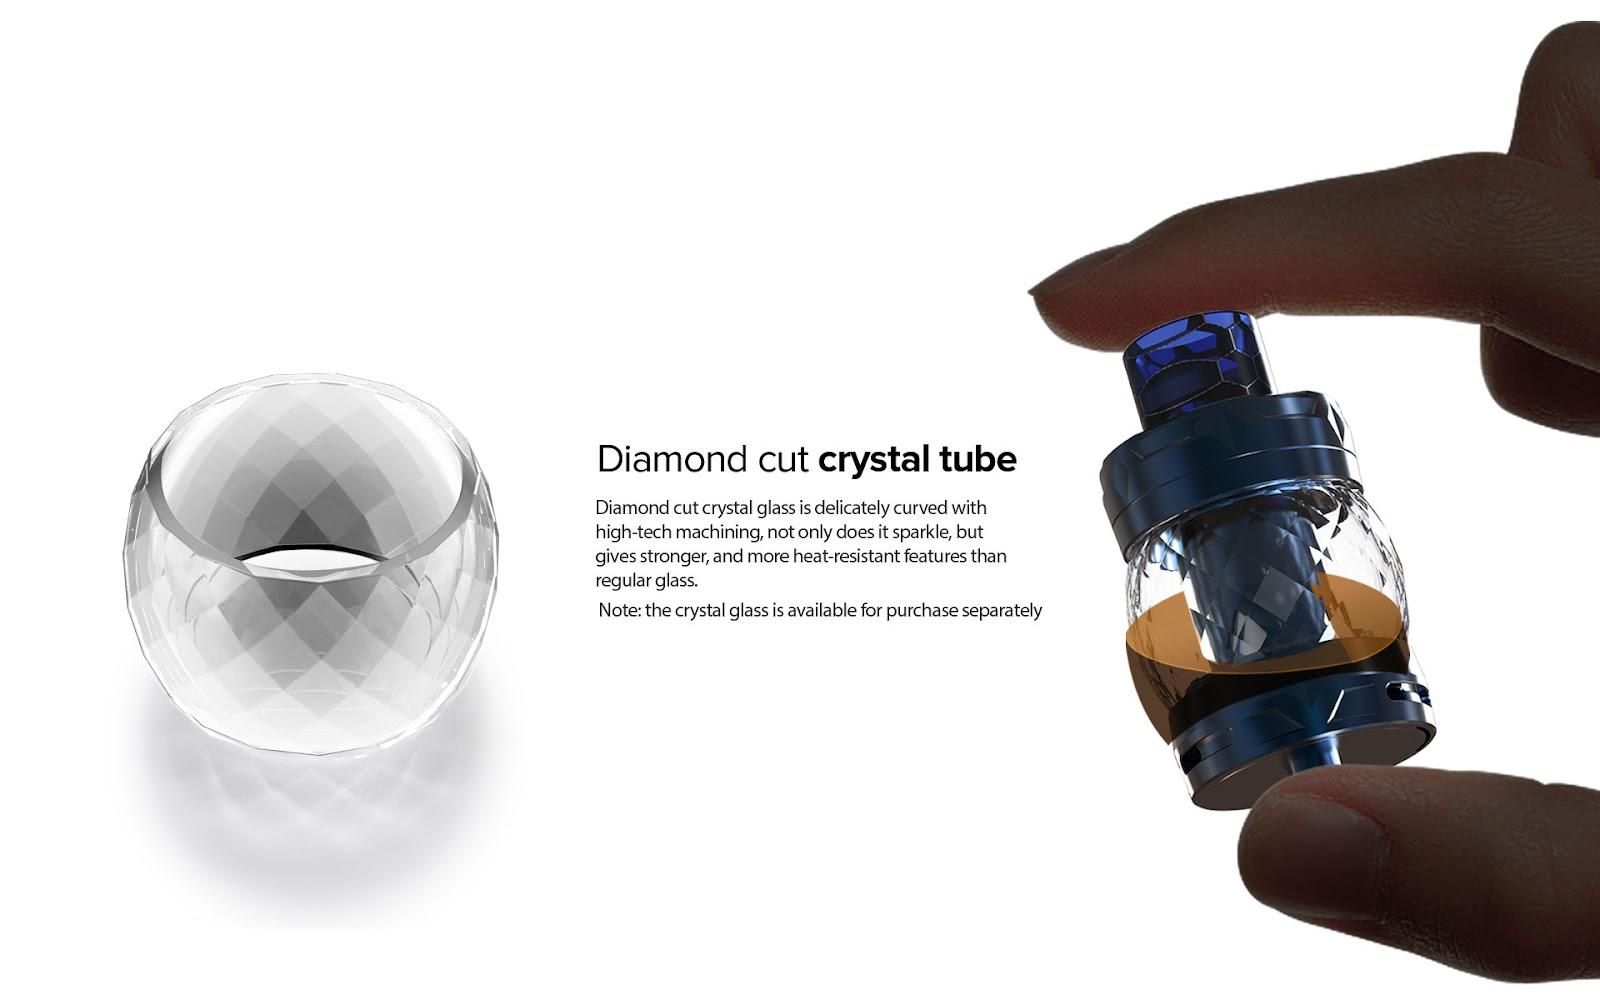 Diamond cut crystal tube